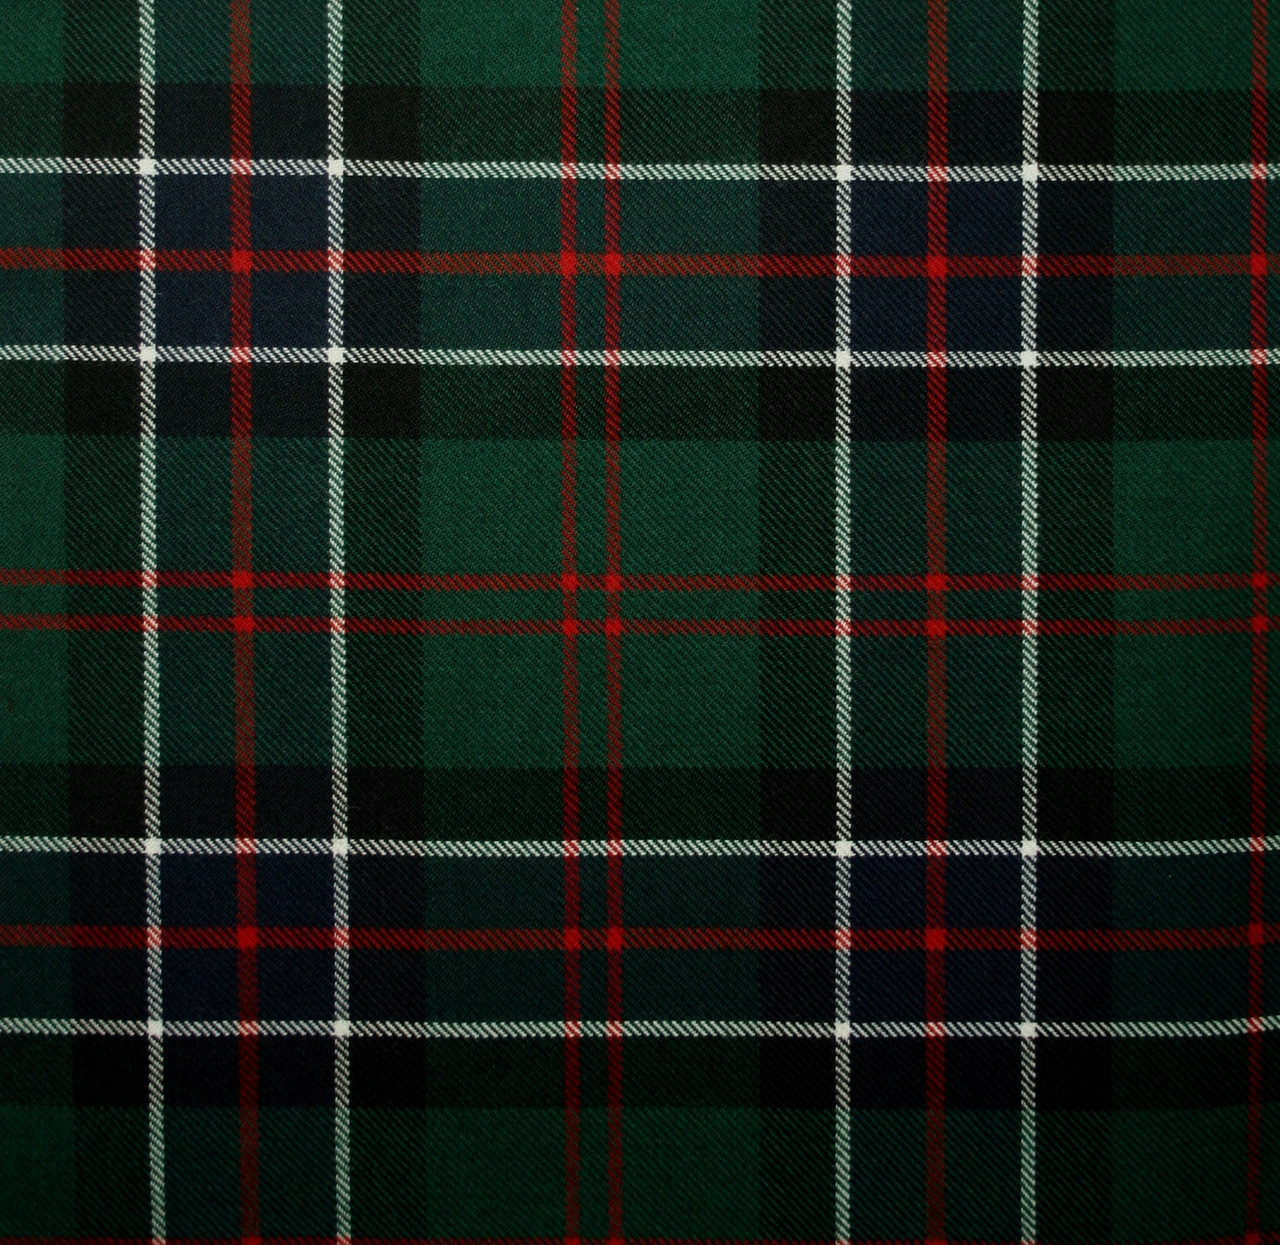 e239a0c84 Sinclair Hunting Modern Light Weight Clan Family Tartan Scottish ...